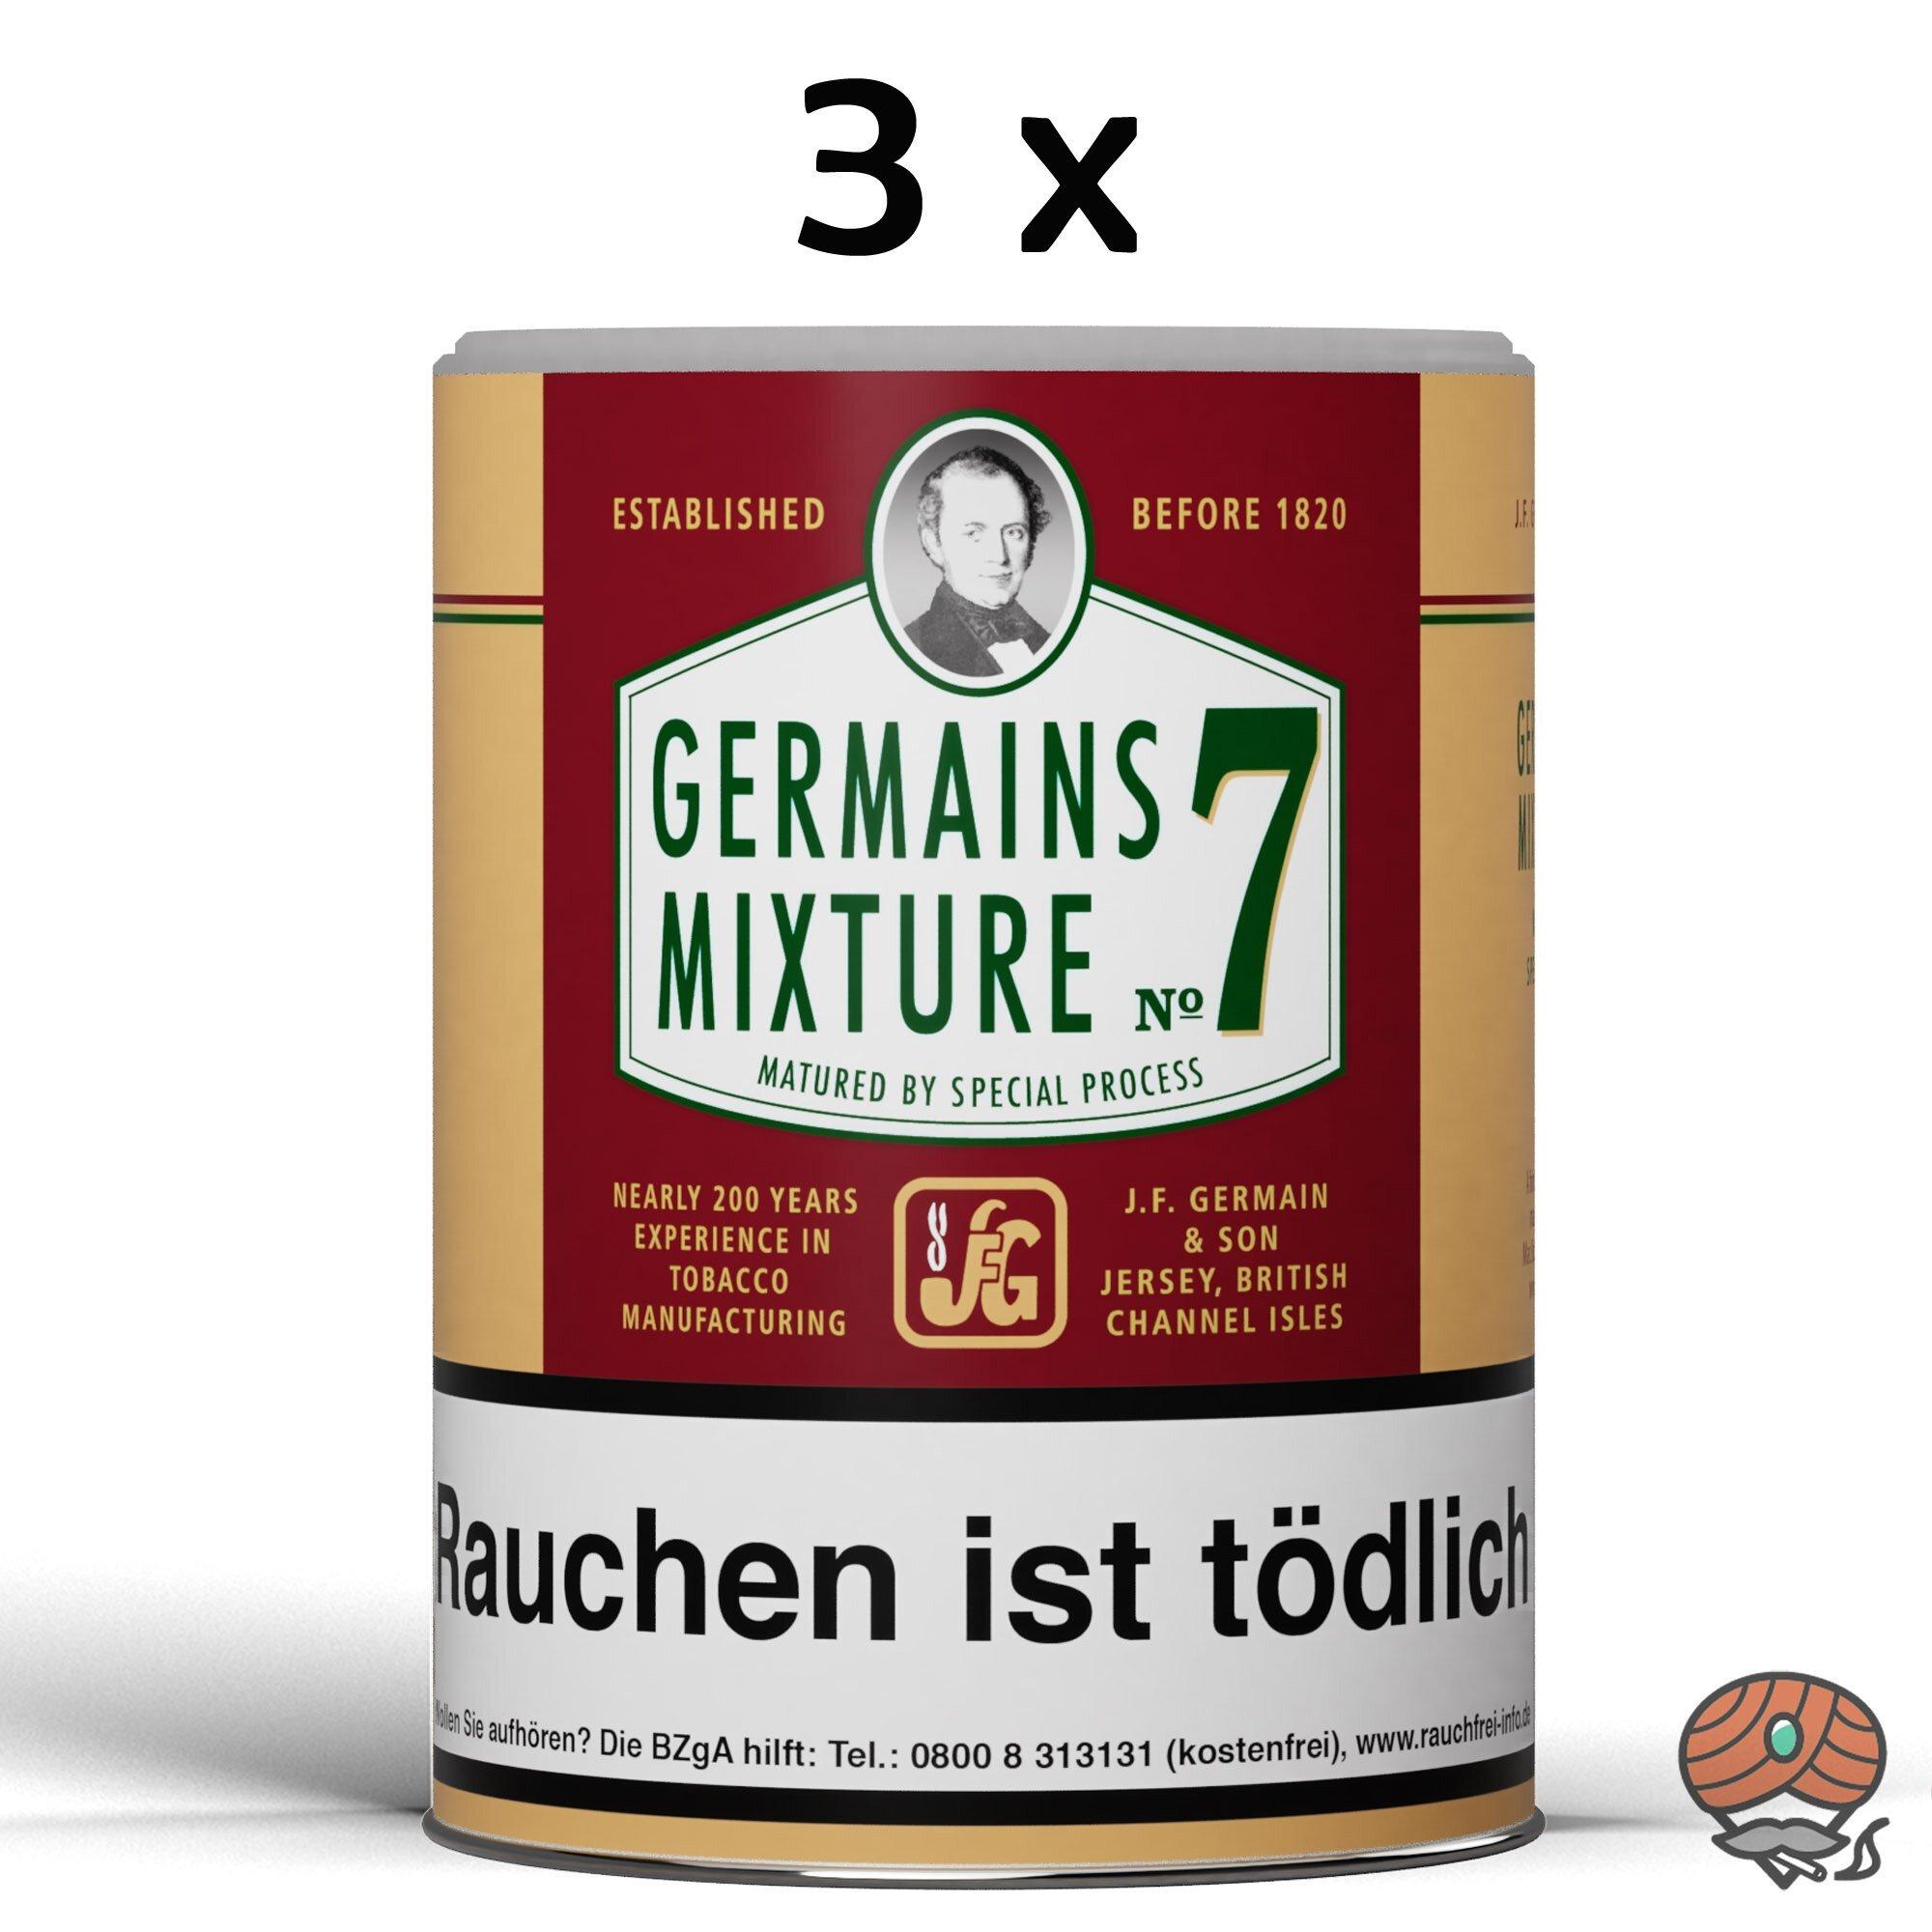 3 x Germain´s Mixture No.7 Pfeifentabak 200g Dosen